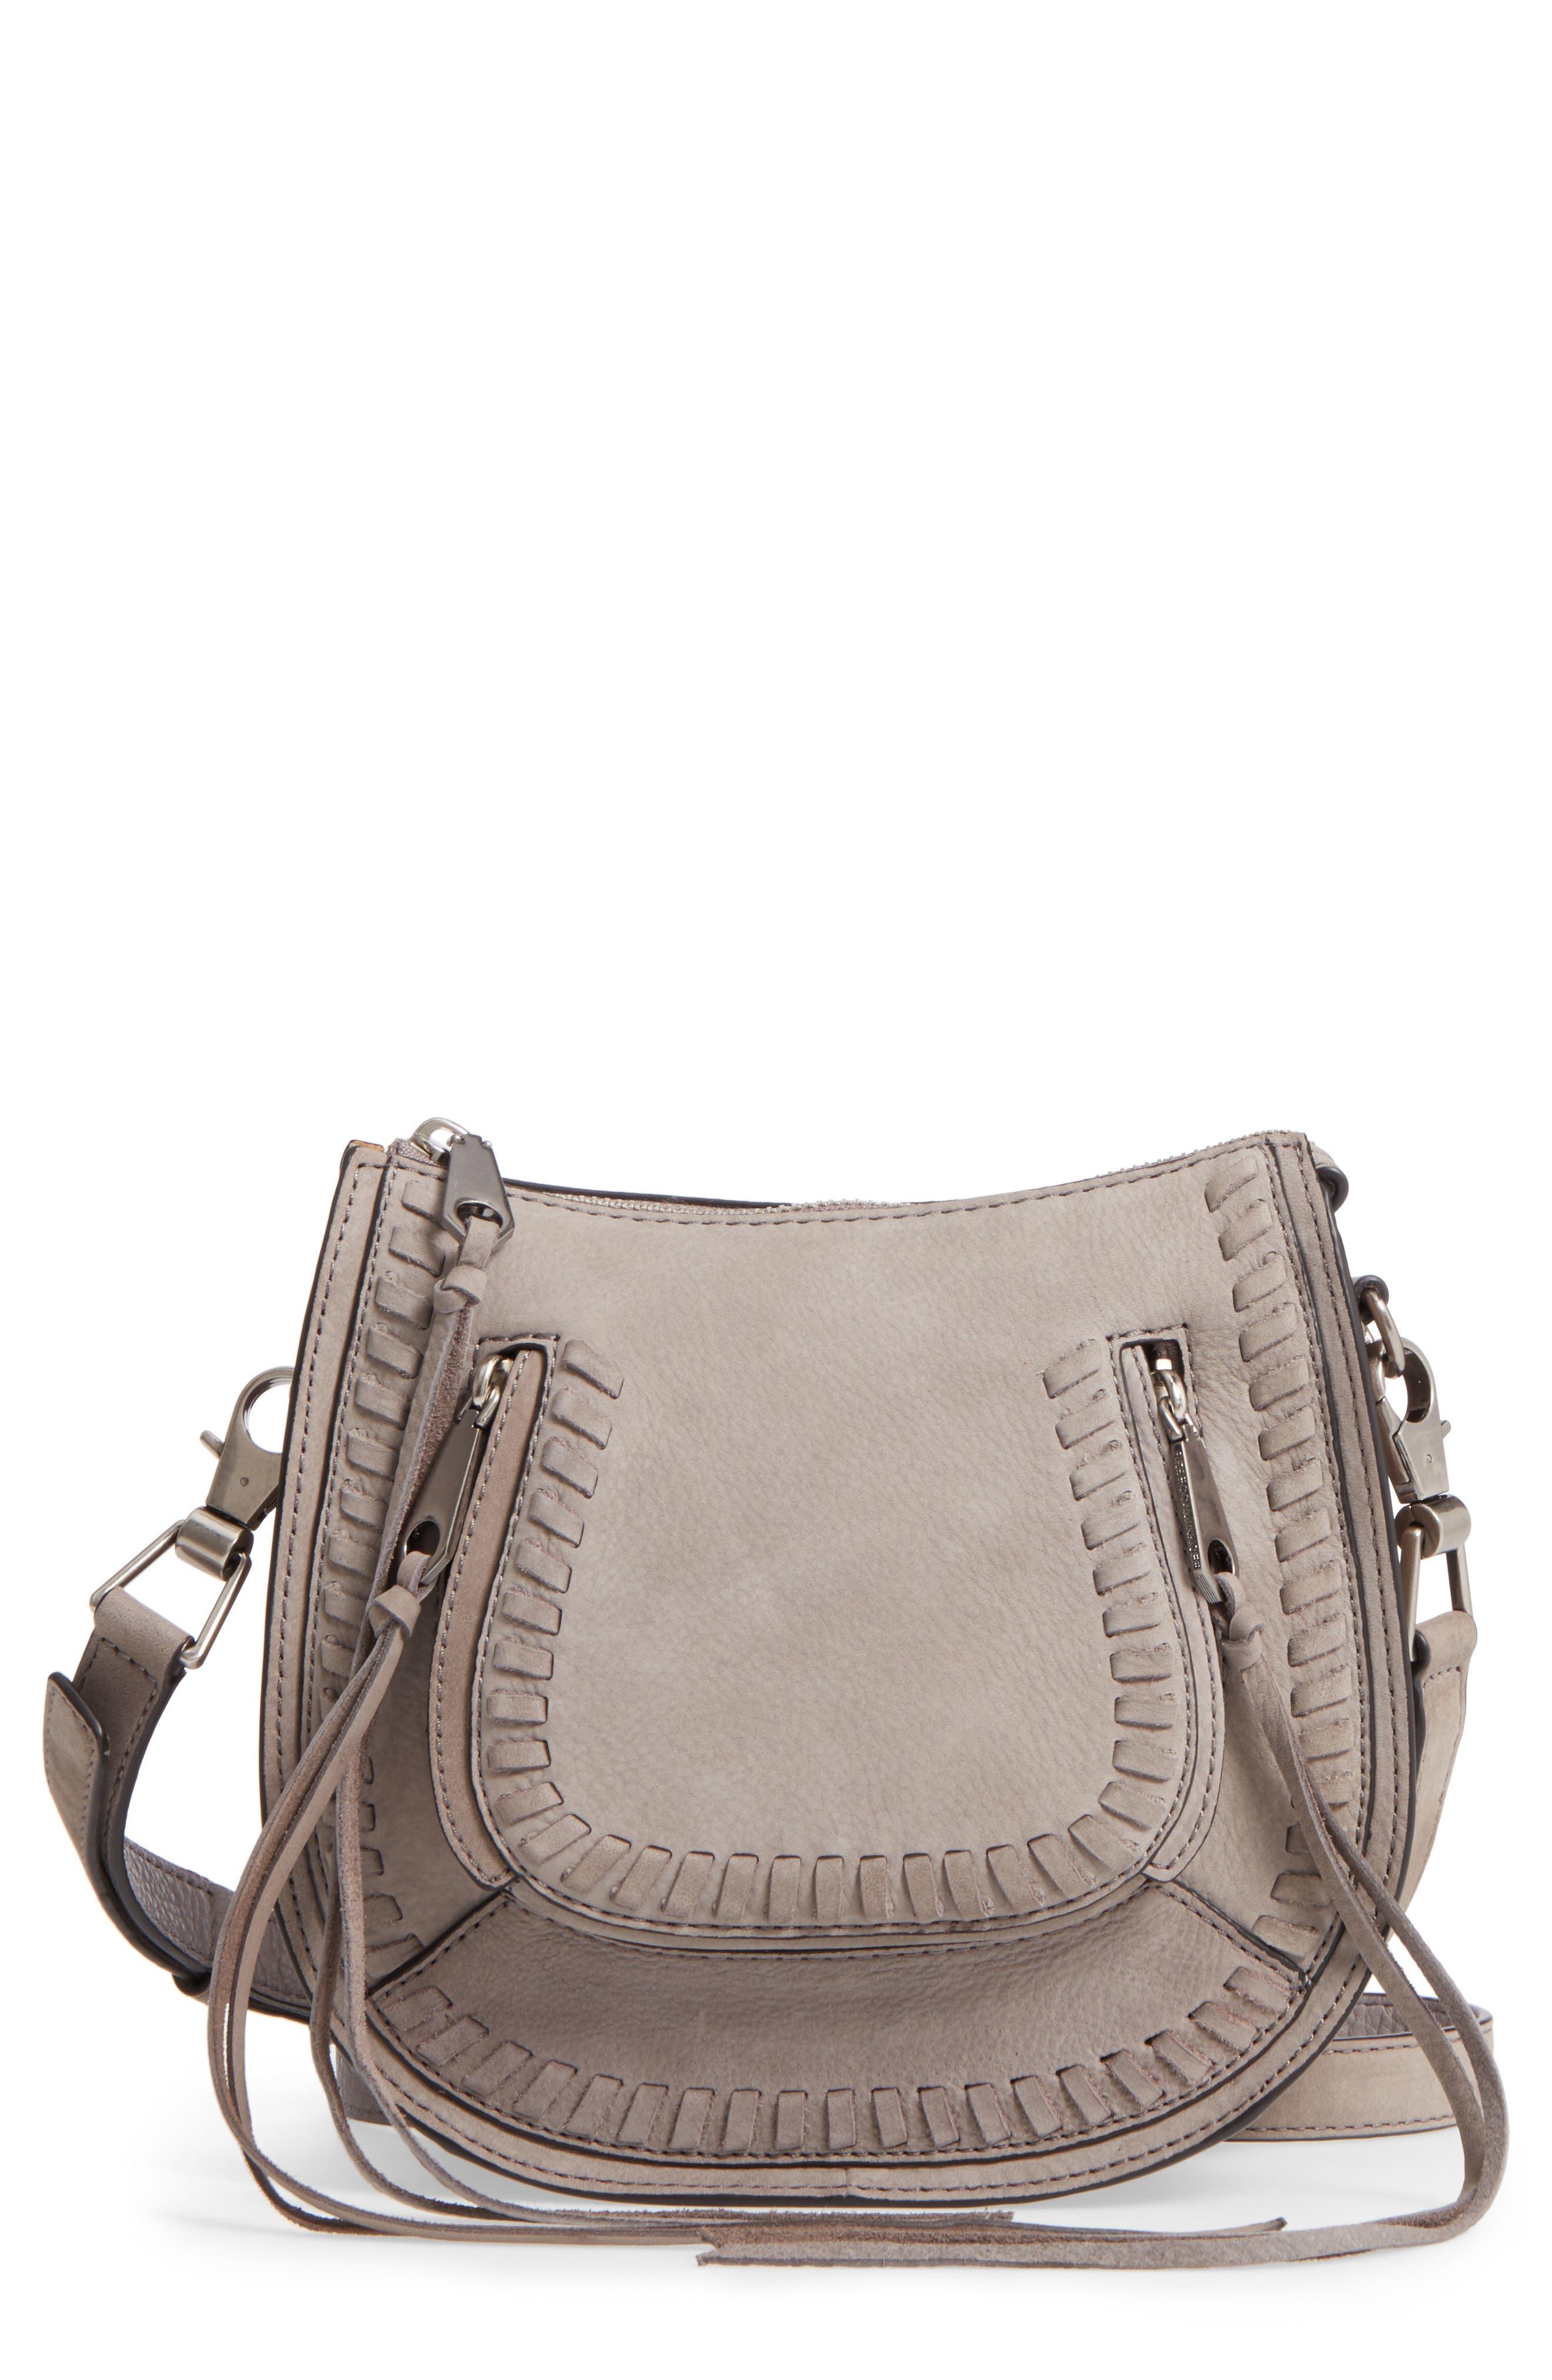 Mini Vanity Saddle Bag,                             Main thumbnail 1, color,                             020